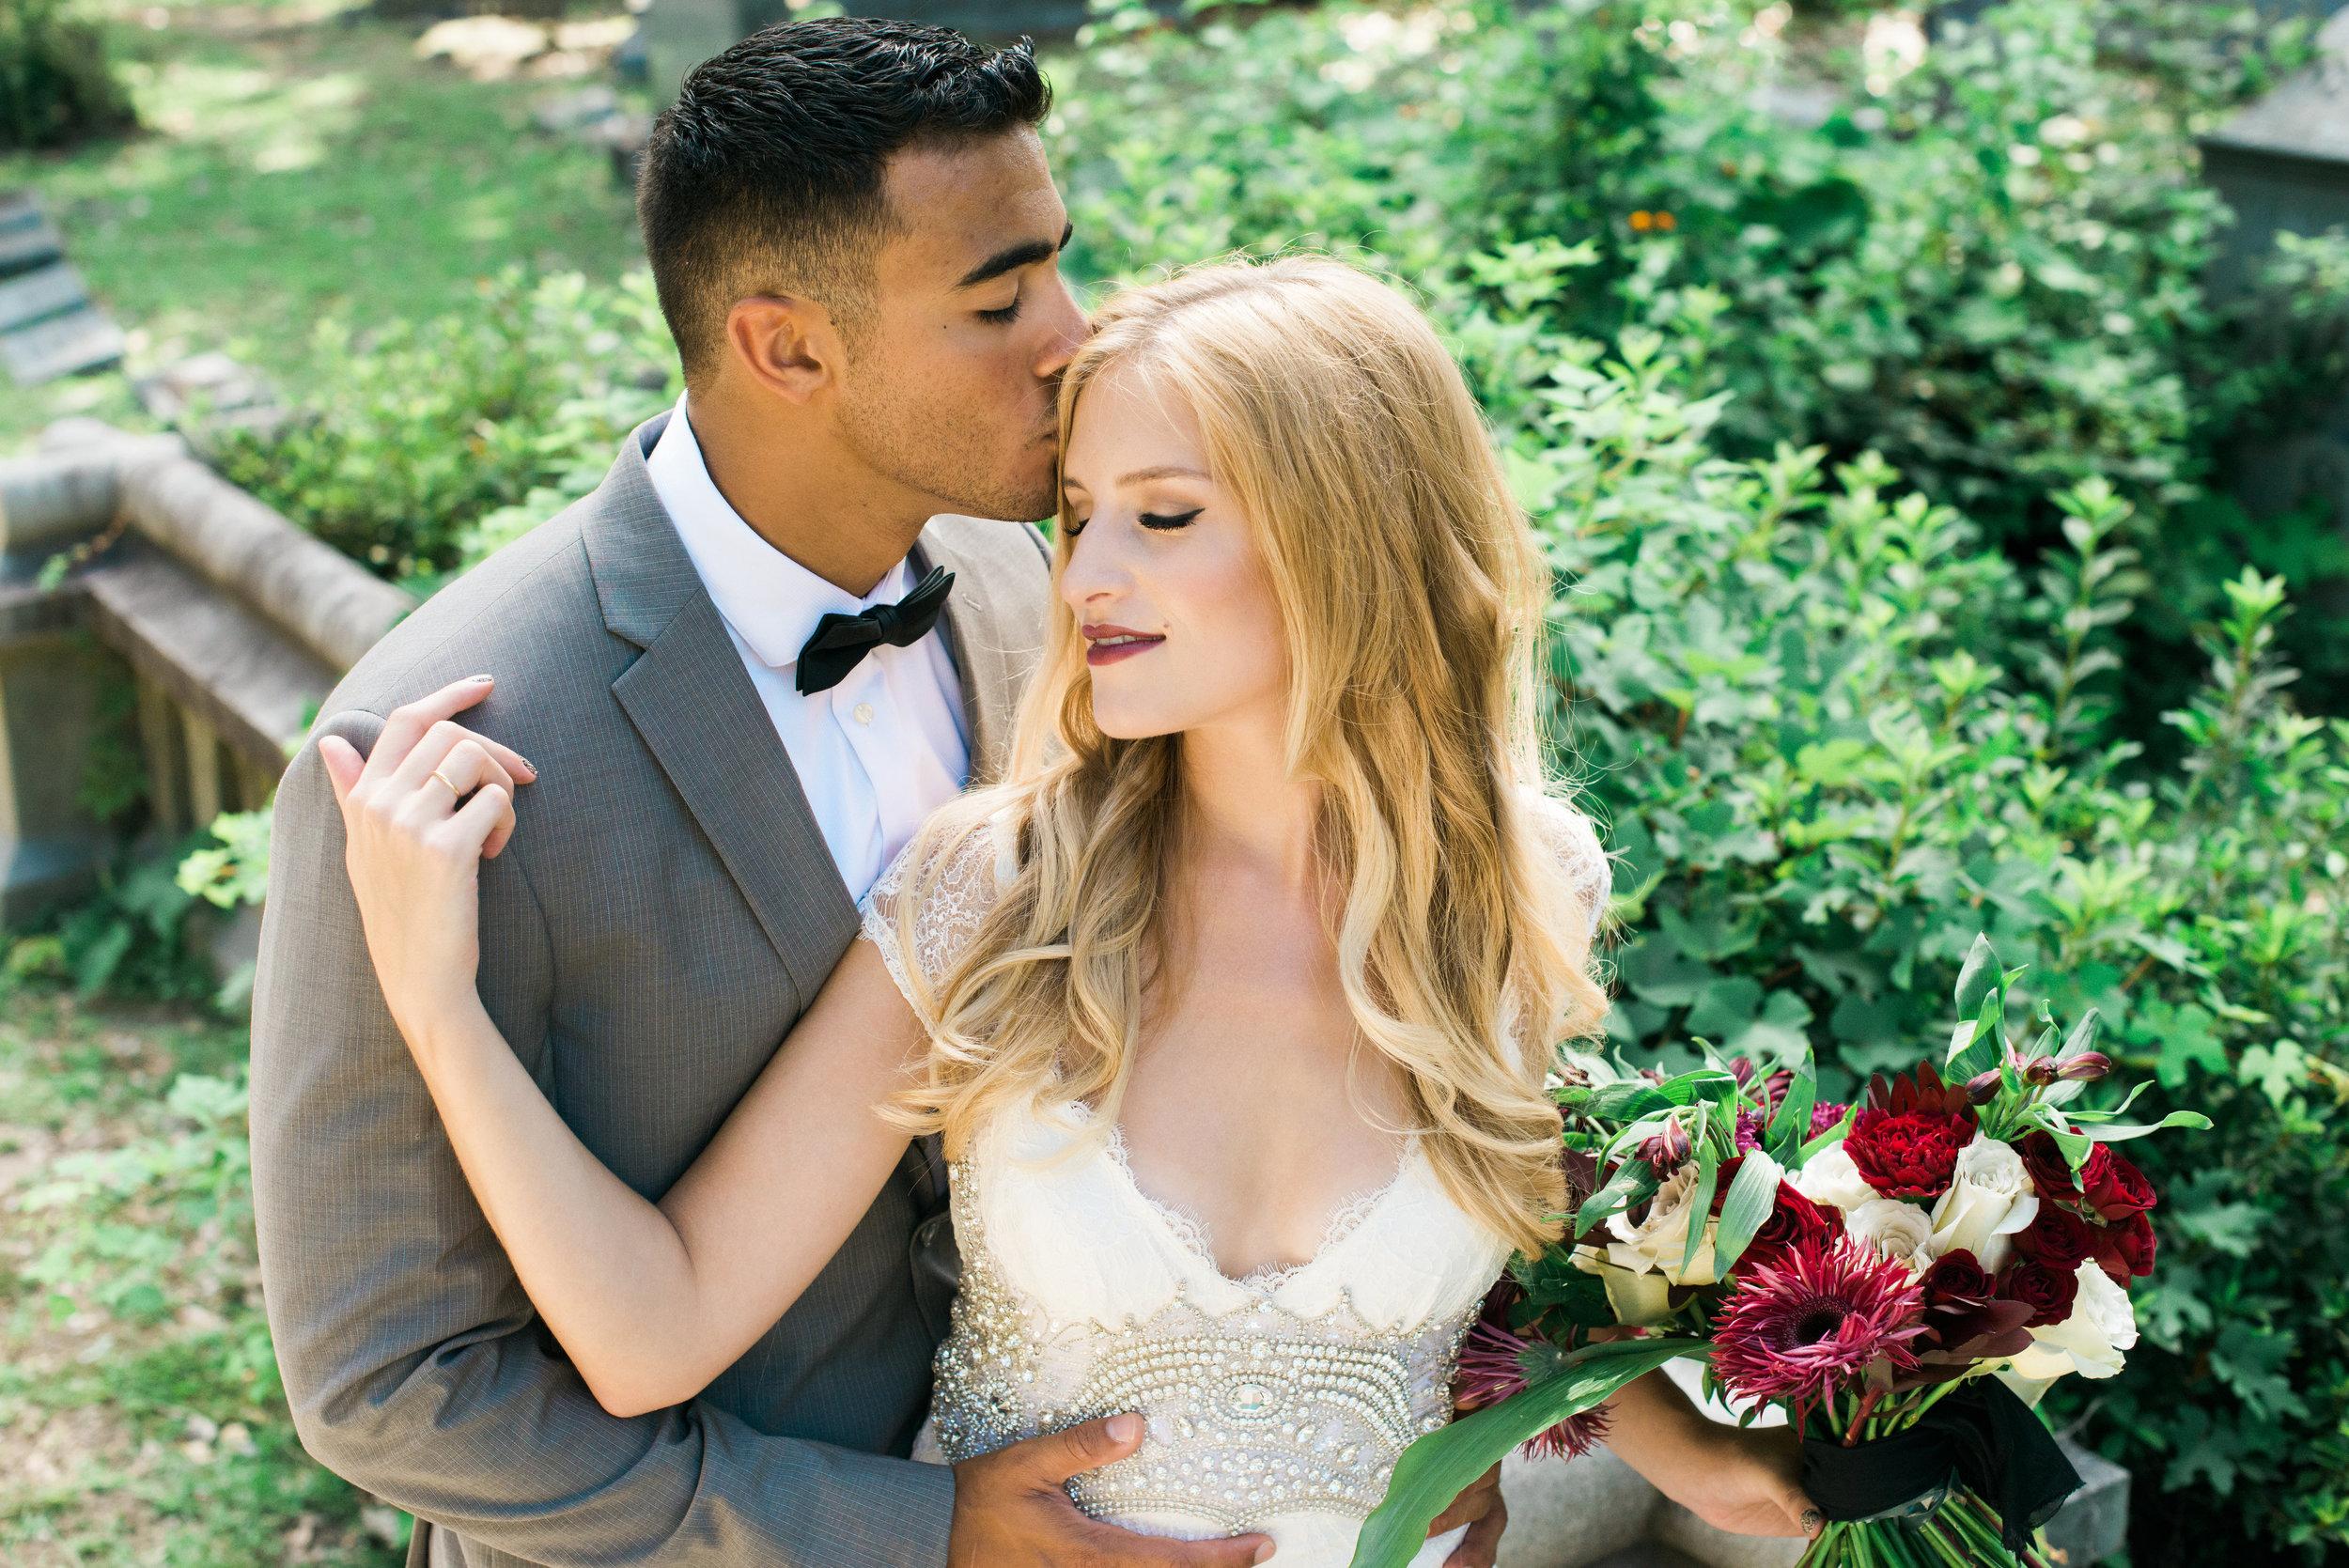 callie-beale-photography-Bonaventure-cemetery-michelle-royal-makeup-cemetery-wedding-ivory-and-beau-wedding-planning-anna-campbell-harper-savannah-bridal-boutique-savannah-wedding-dresses-savannah-weddings-12.jpg